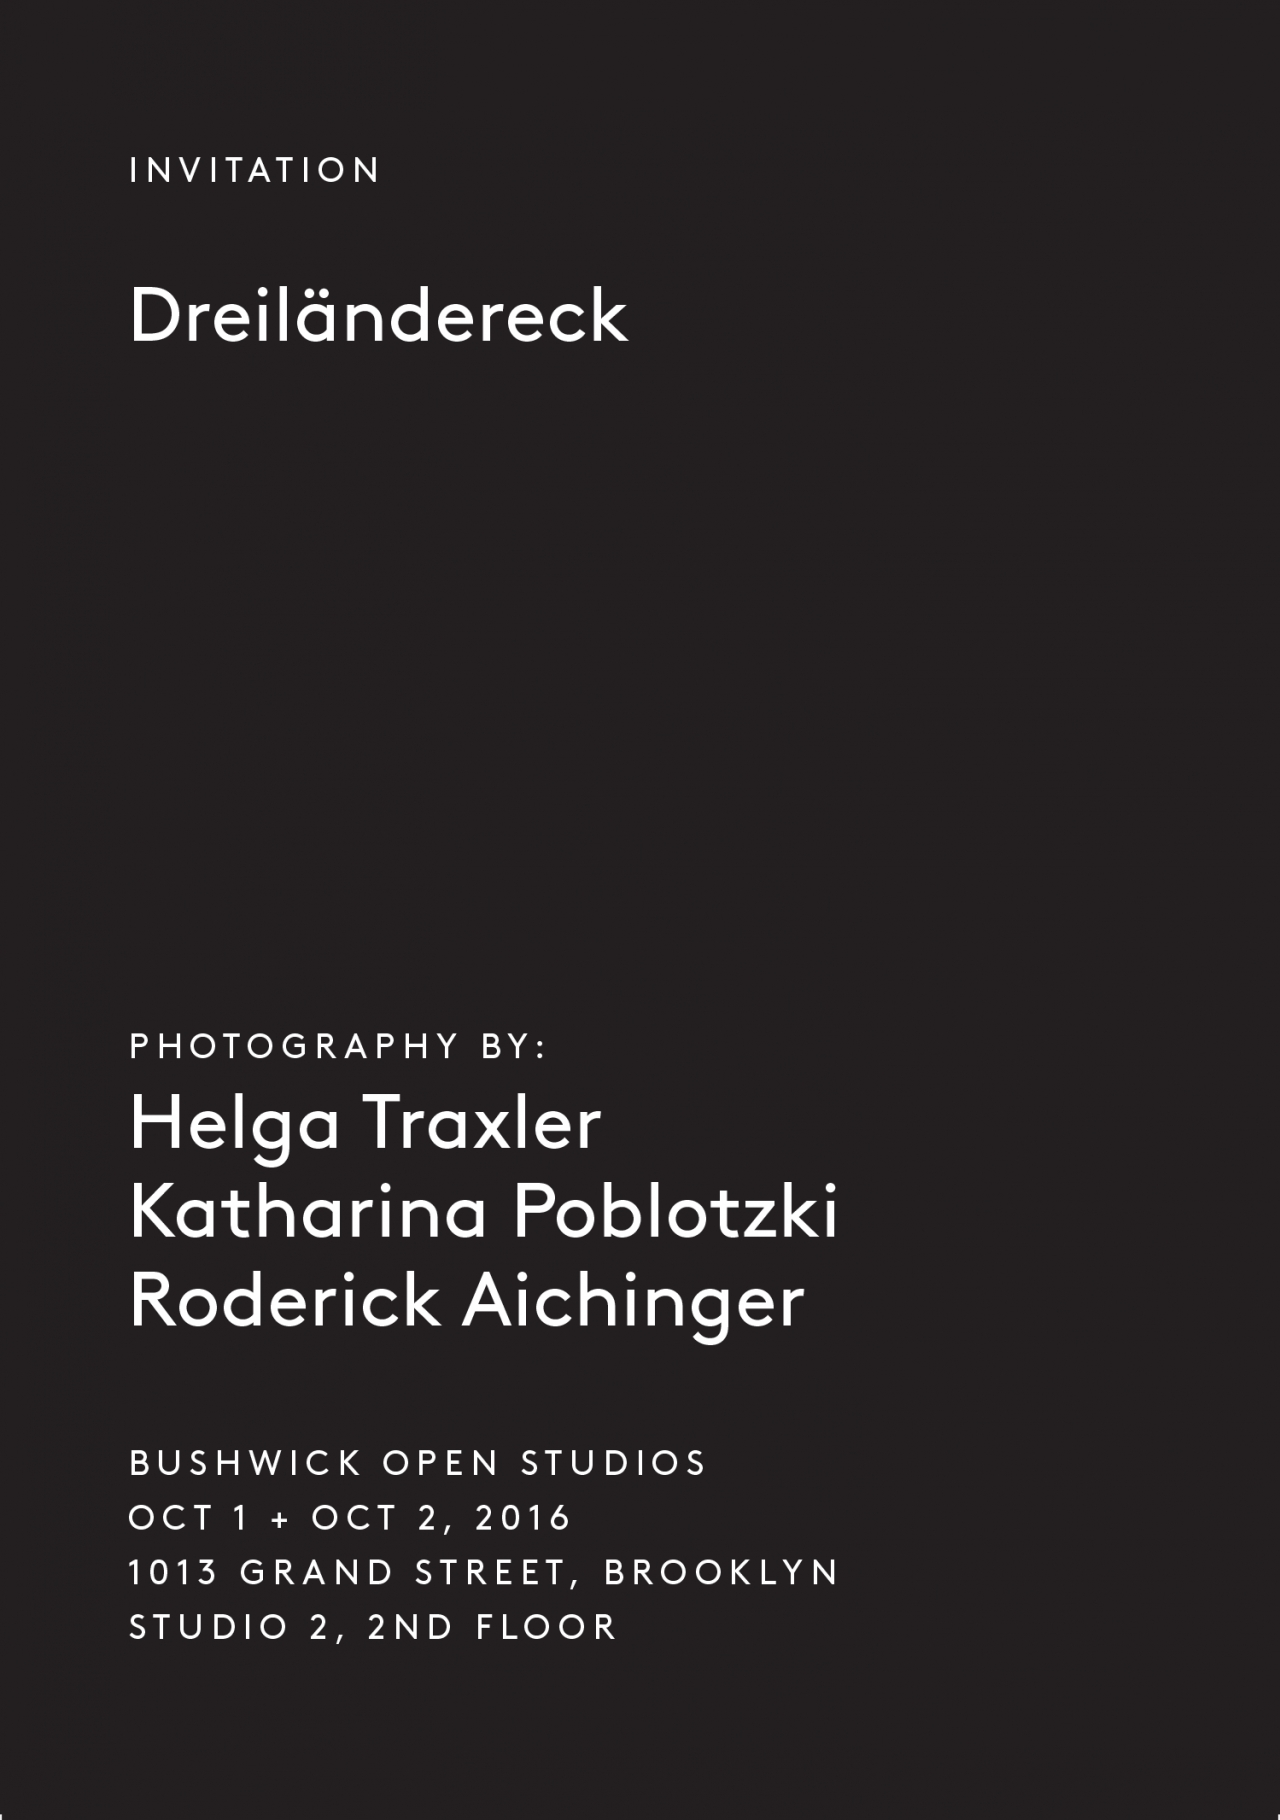 Helga Traxler News